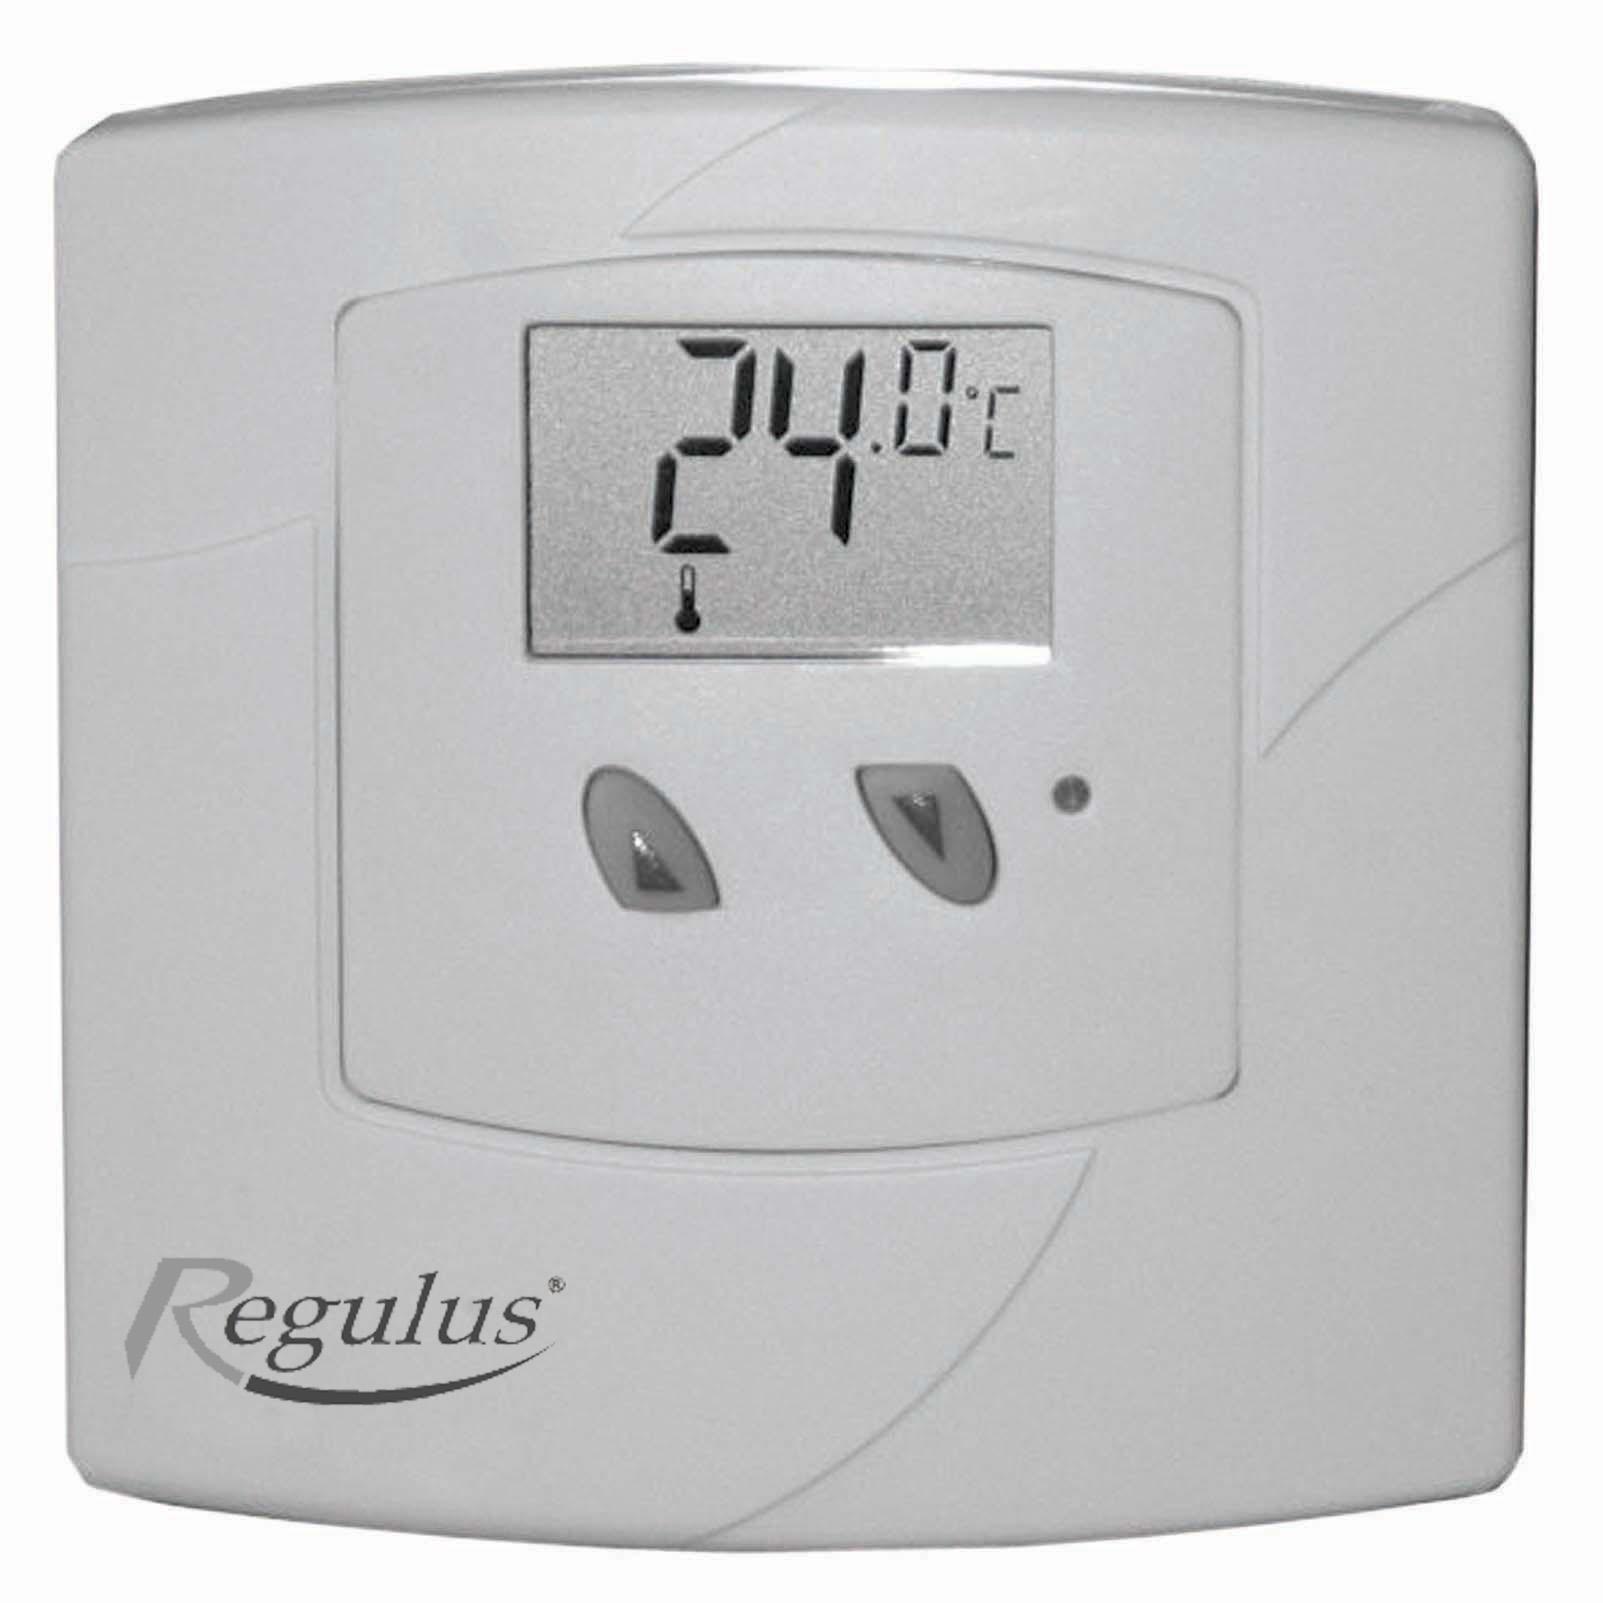 Pokojový termostat TP18-Regulus, elektronický s displejem, 24/230V, AC - baterie